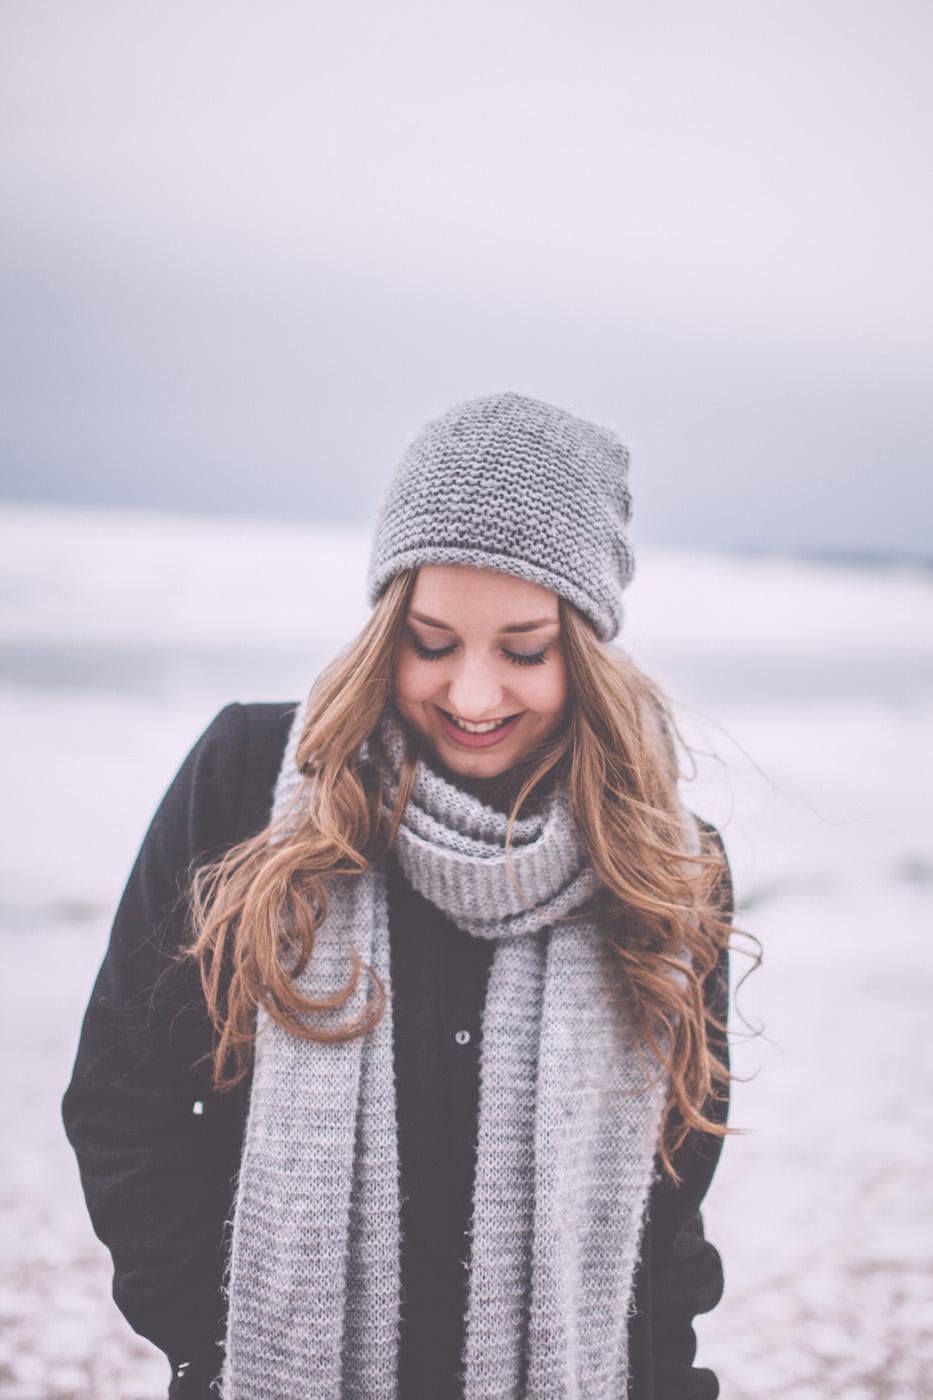 winter on location artist portrait